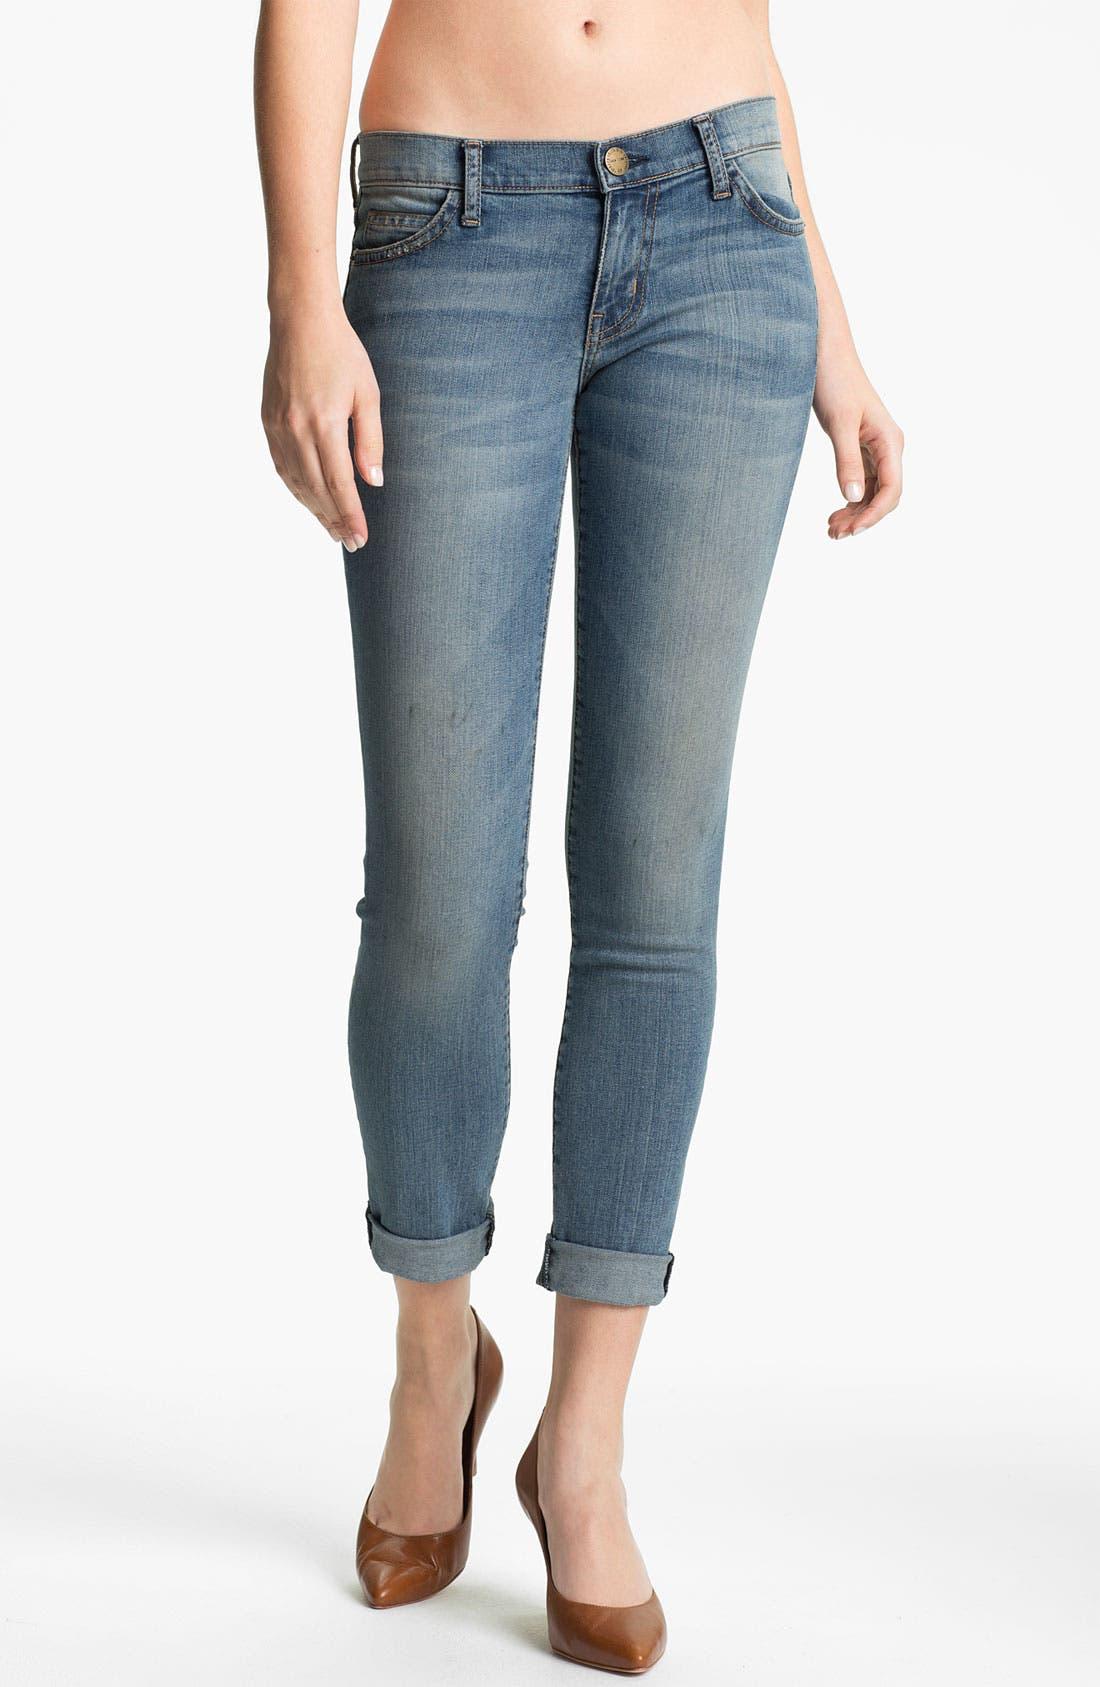 Alternate Image 1 Selected - Current/Elliott 'The Rolled' Skinny Jeans (Bleecker)